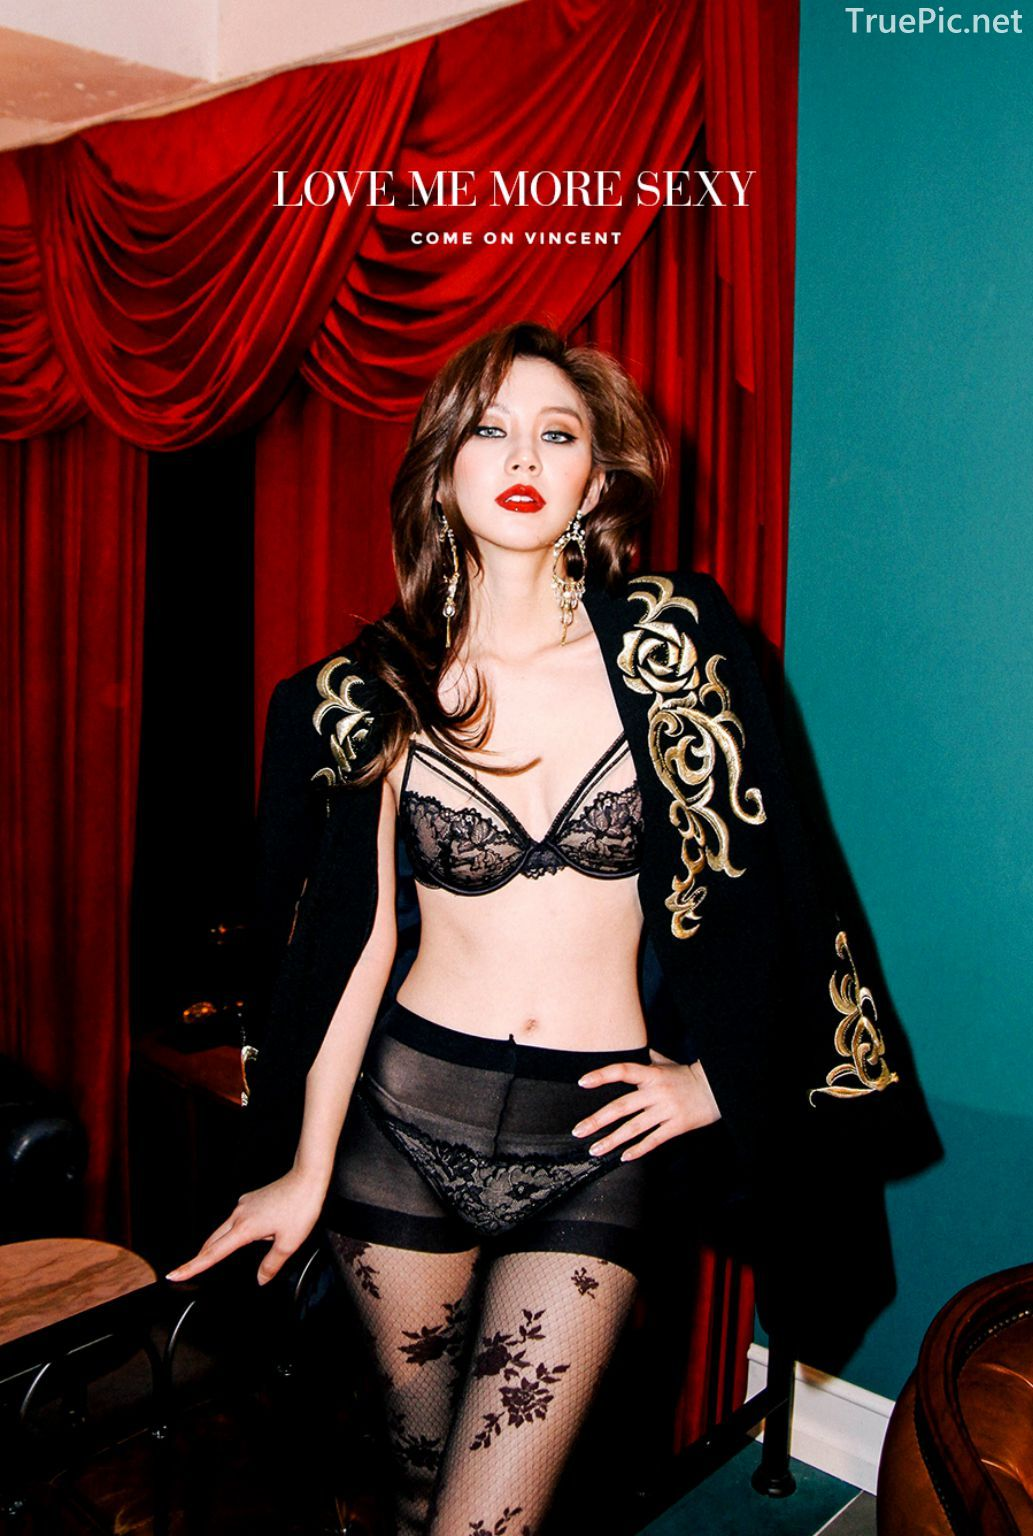 Lee Chae Eun - Korean Lingerie Model - Love Me More Sexy - TruePic.net - Picture 8